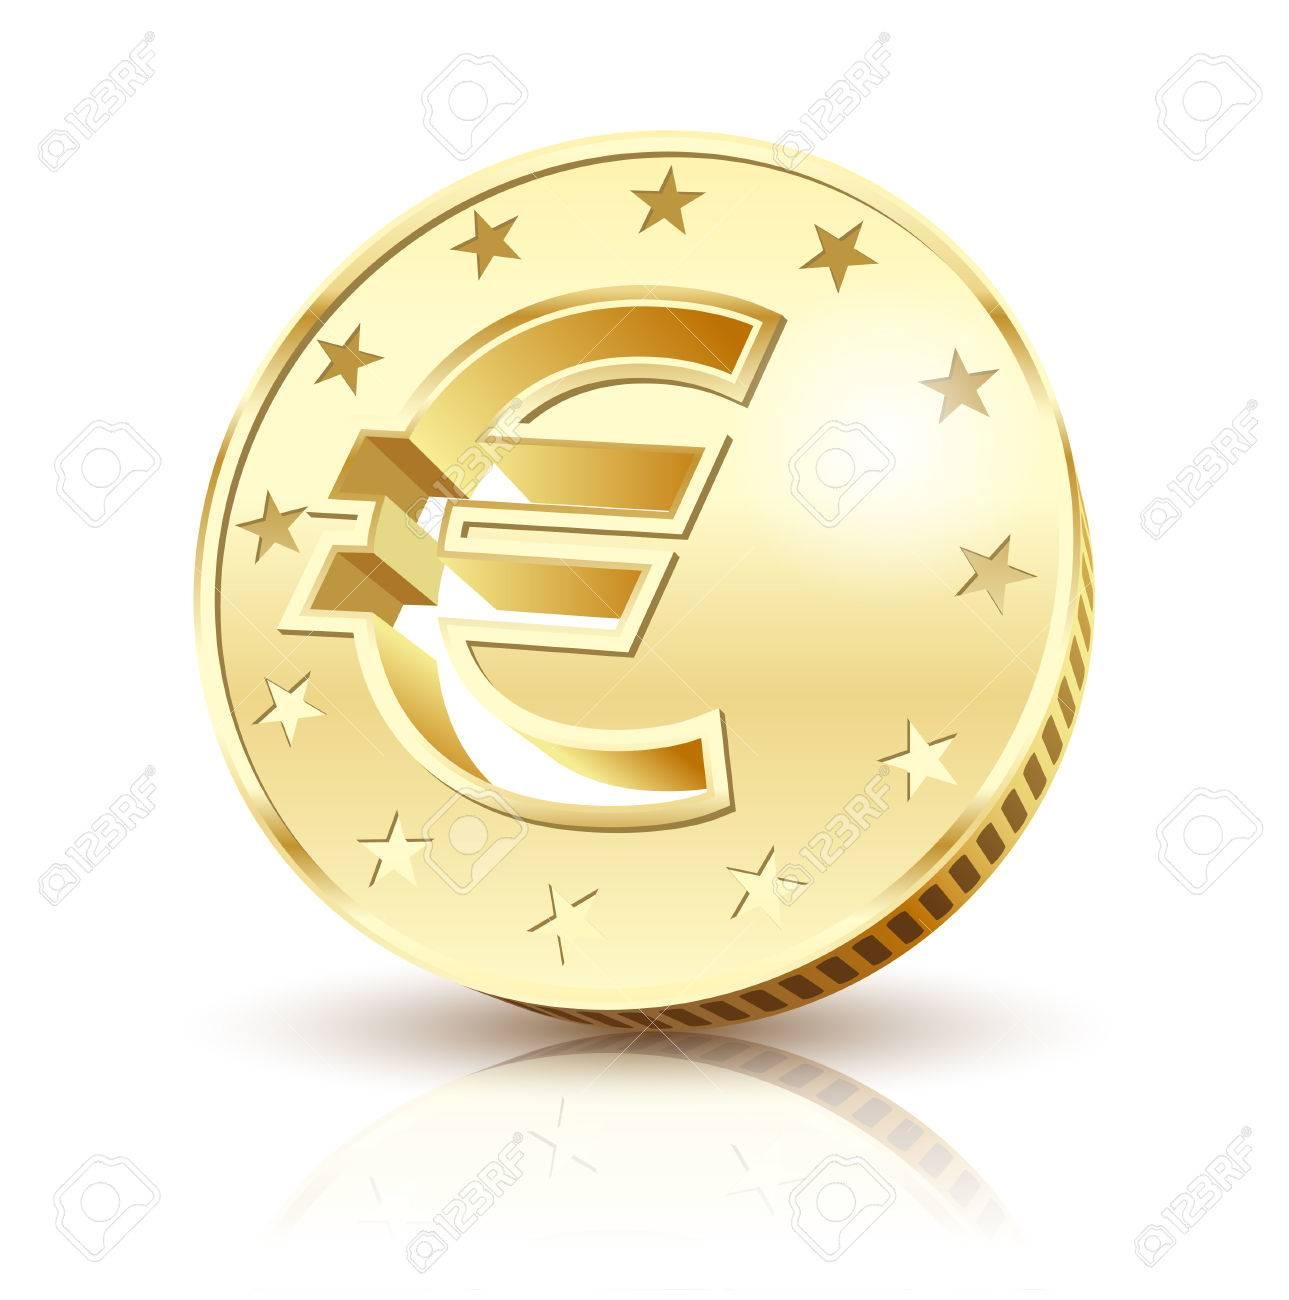 Coin Golden Euro isolated on a white background. Illustration Vector Standard-Bild - 45891046